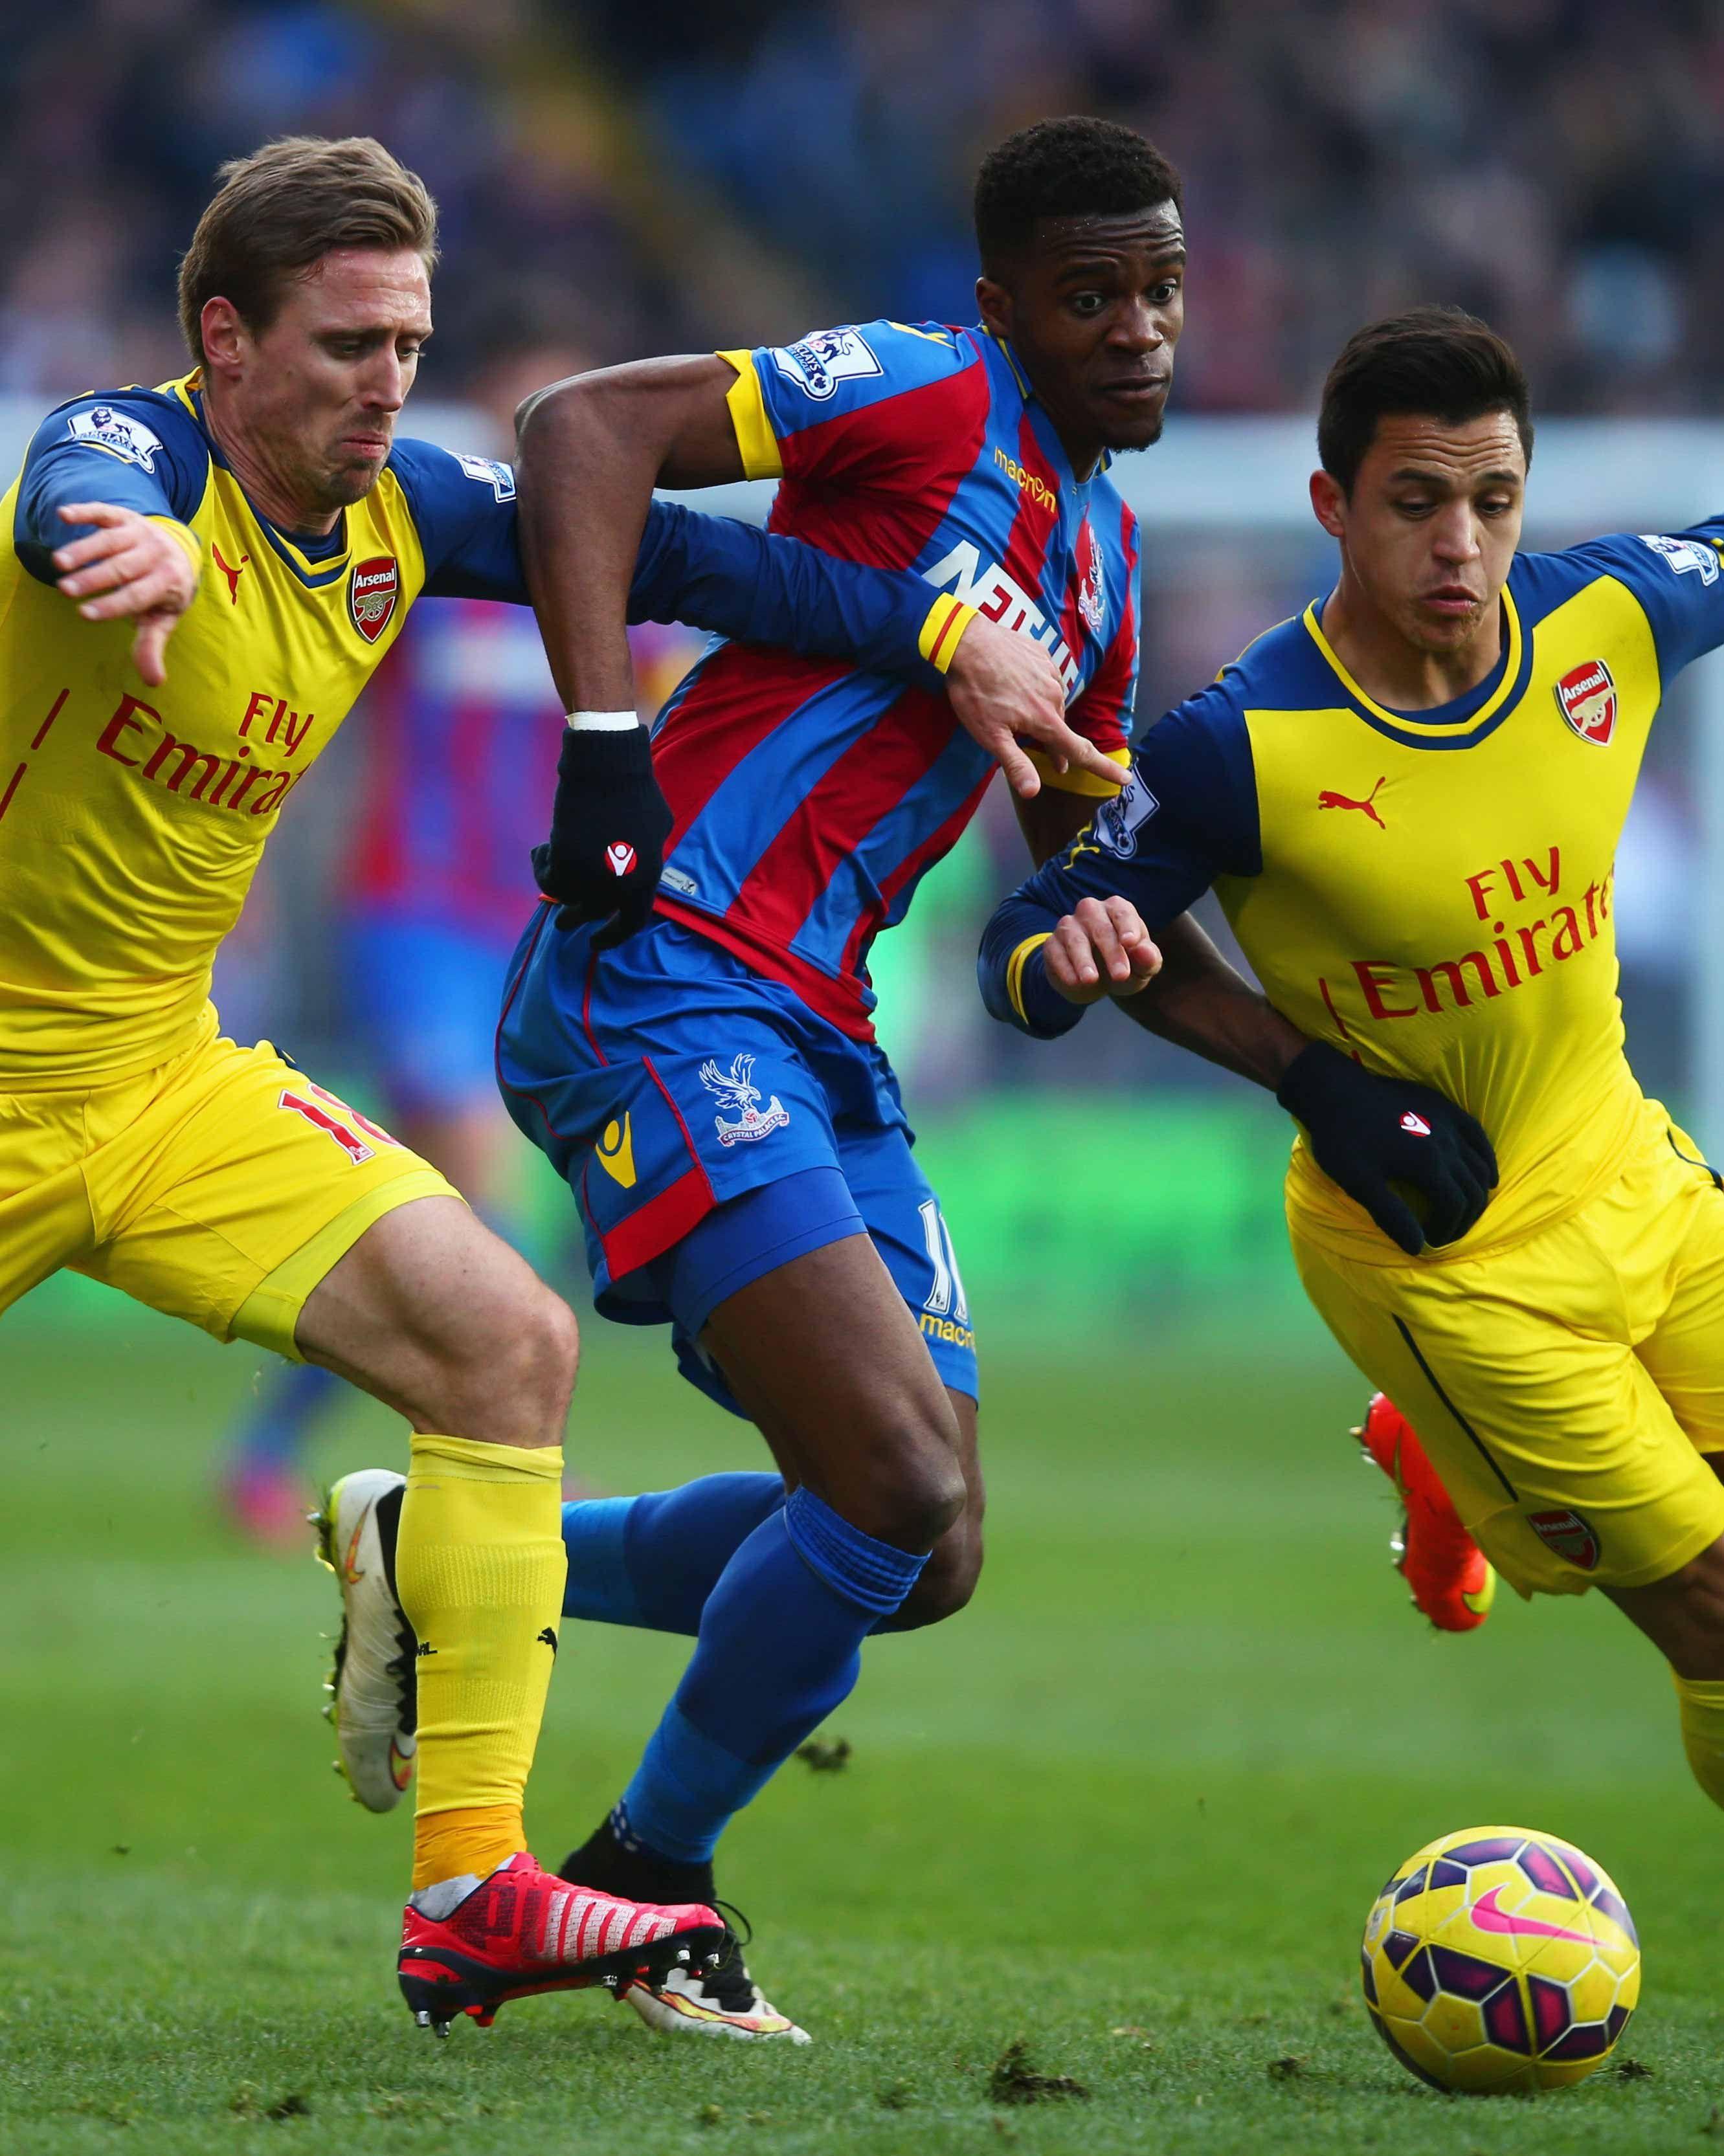 Barclays Premier League CRYSTAL PALACE VS ARSENAL